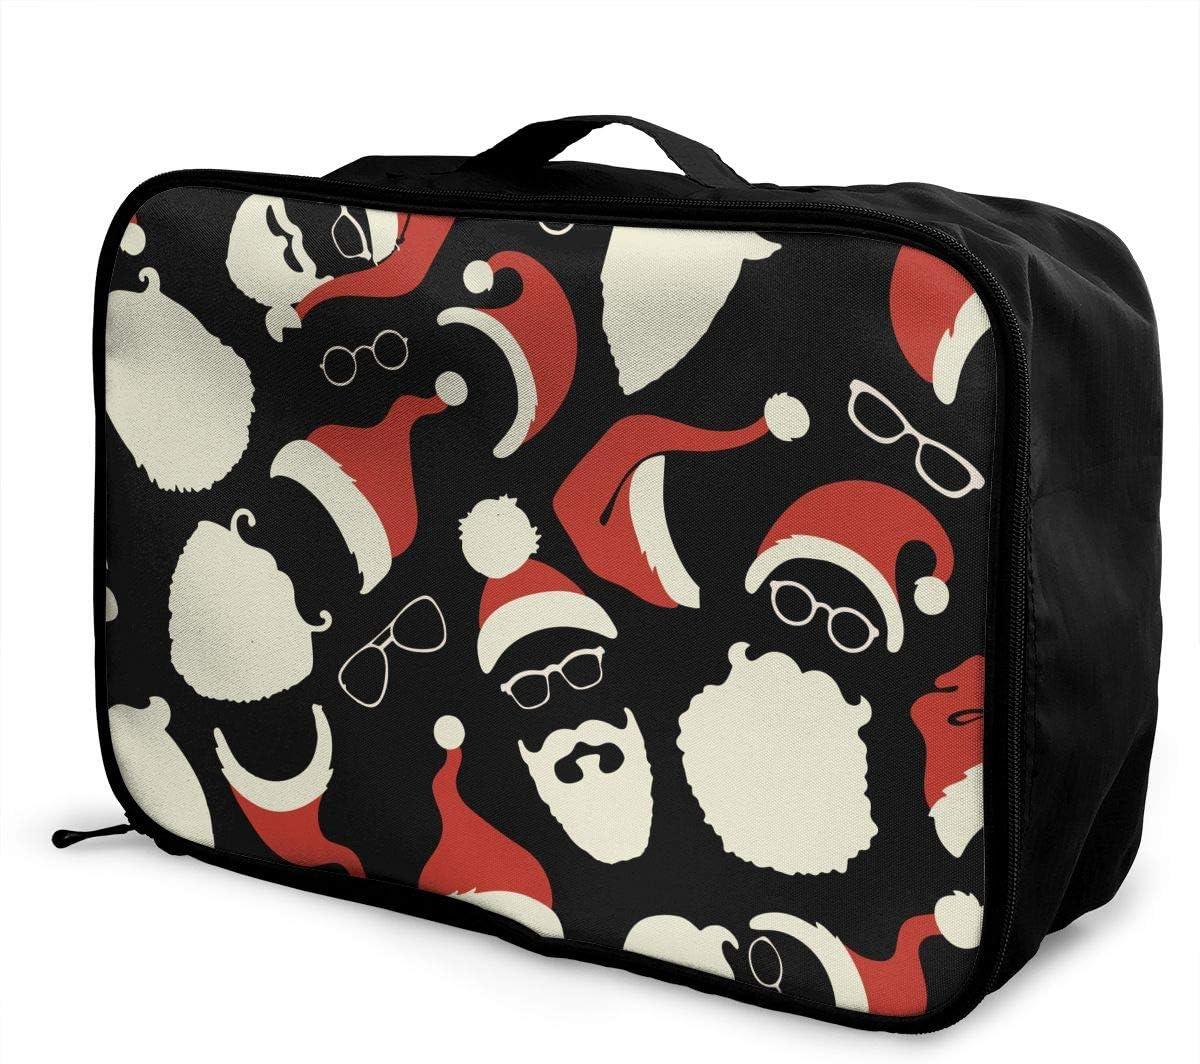 YueLJB Santa Hats Beards Eyeglasses Lightweight Large Capacity Portable Luggage Bag Travel Duffel Bag Storage Carry Luggage Duffle Tote Bag